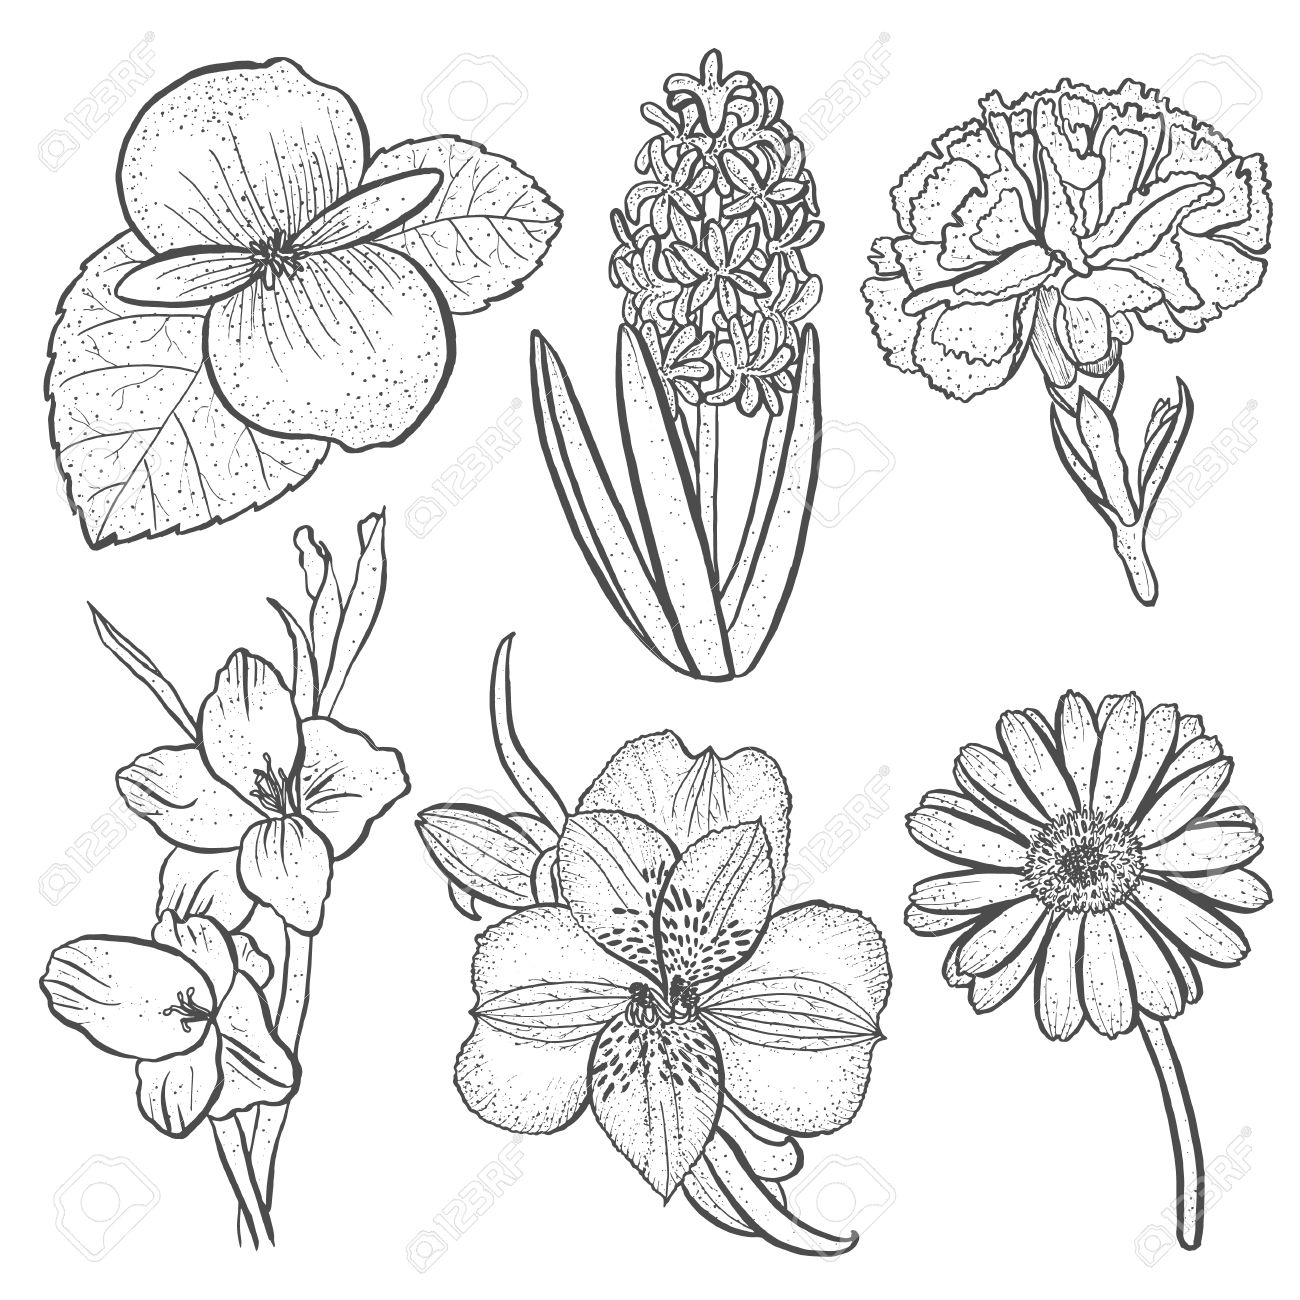 1300x1300 Set Of Flowers Alstroemeria, Begonia, Carnation, Gerbera